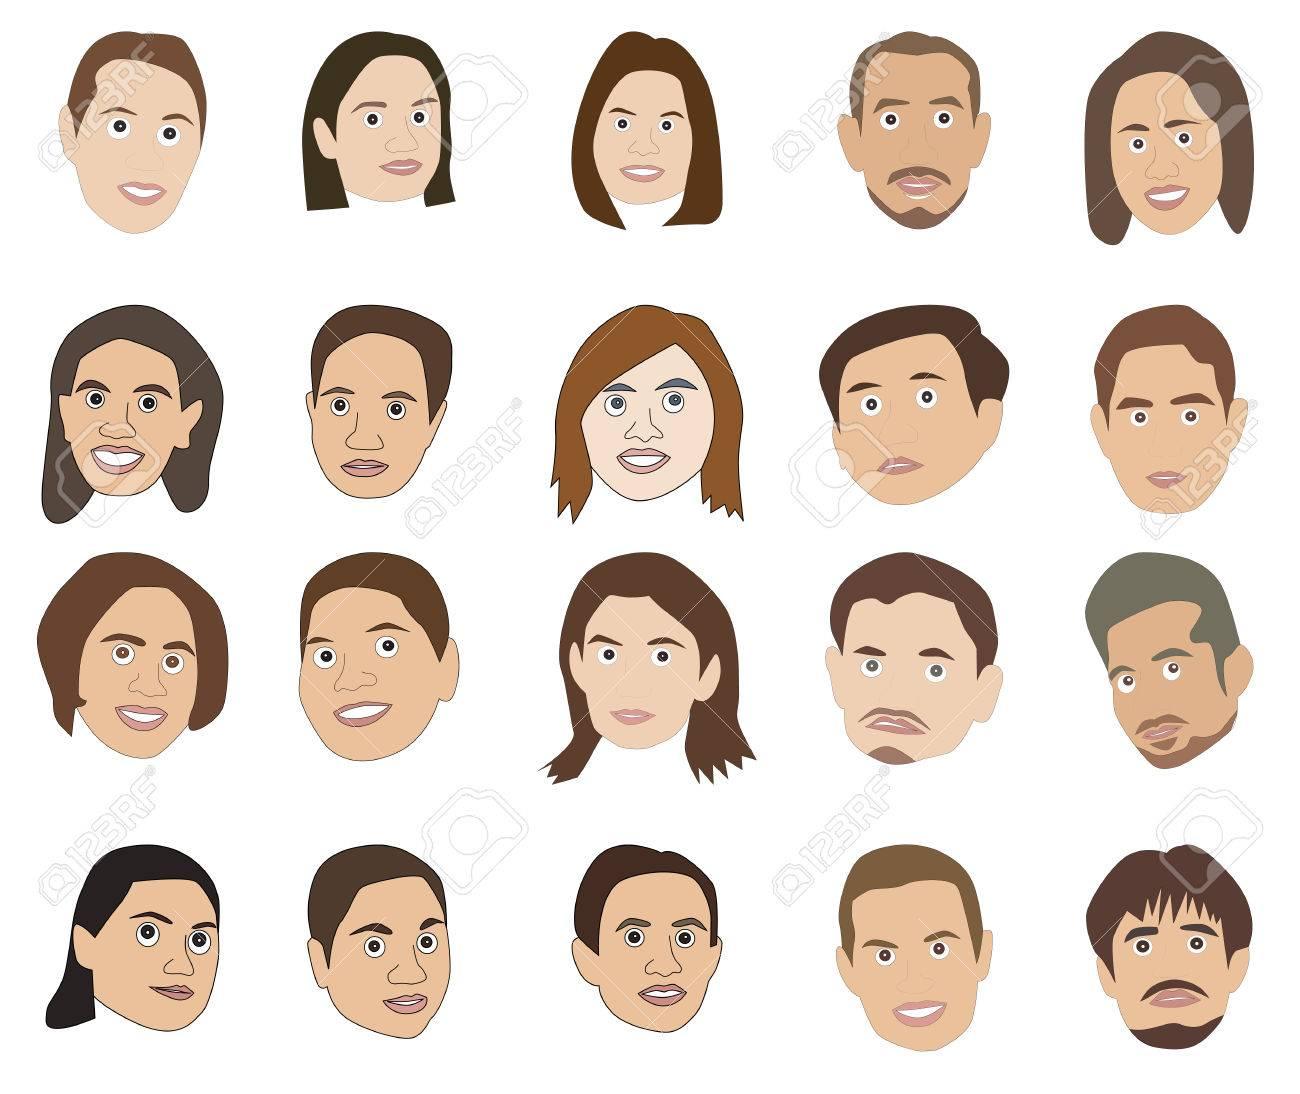 illustration of cartoon avatar human faces royalty free cliparts